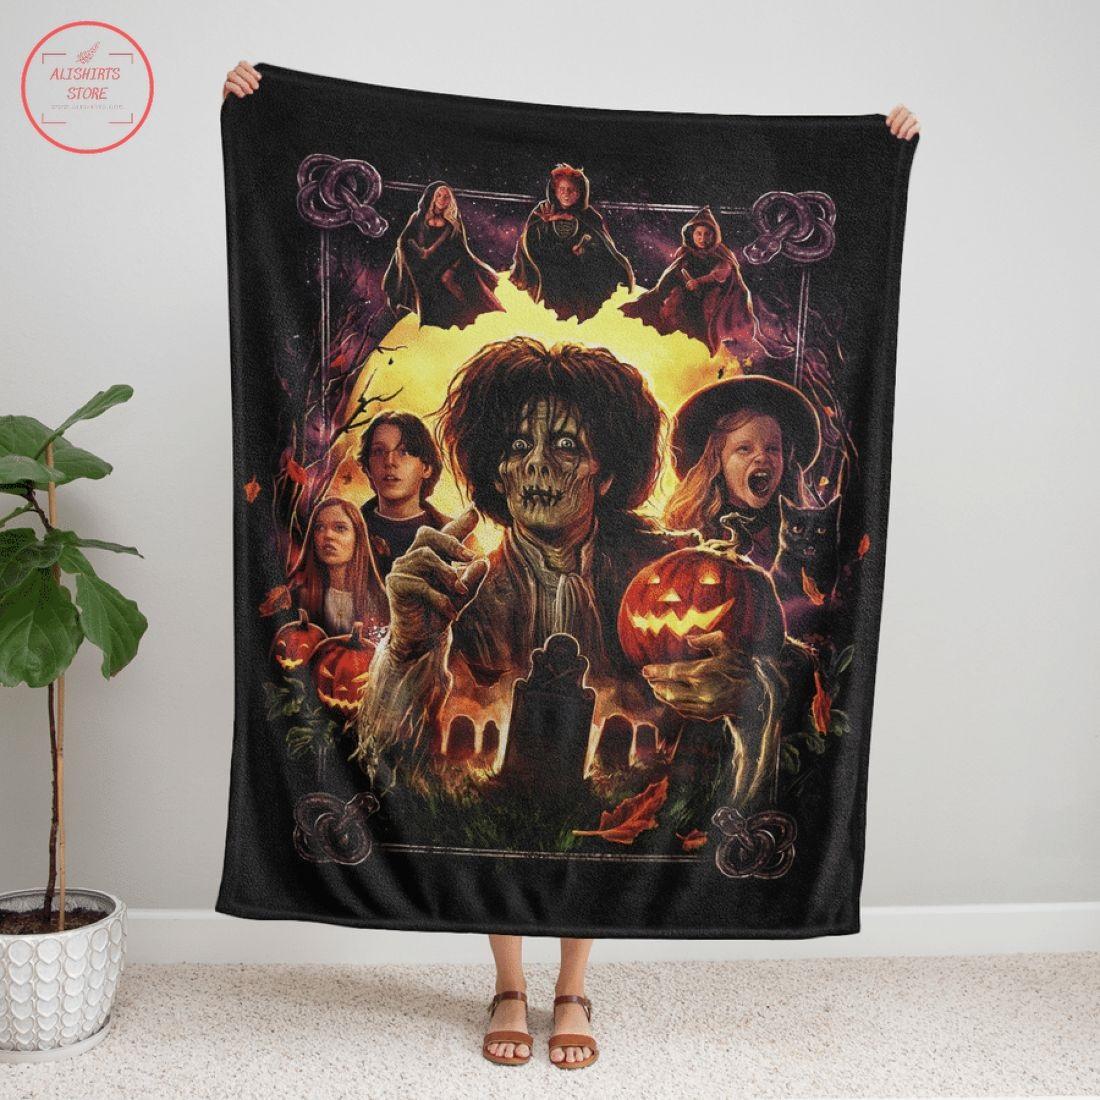 Hocus Pocus Another Glorious Morning Halloween Blanket